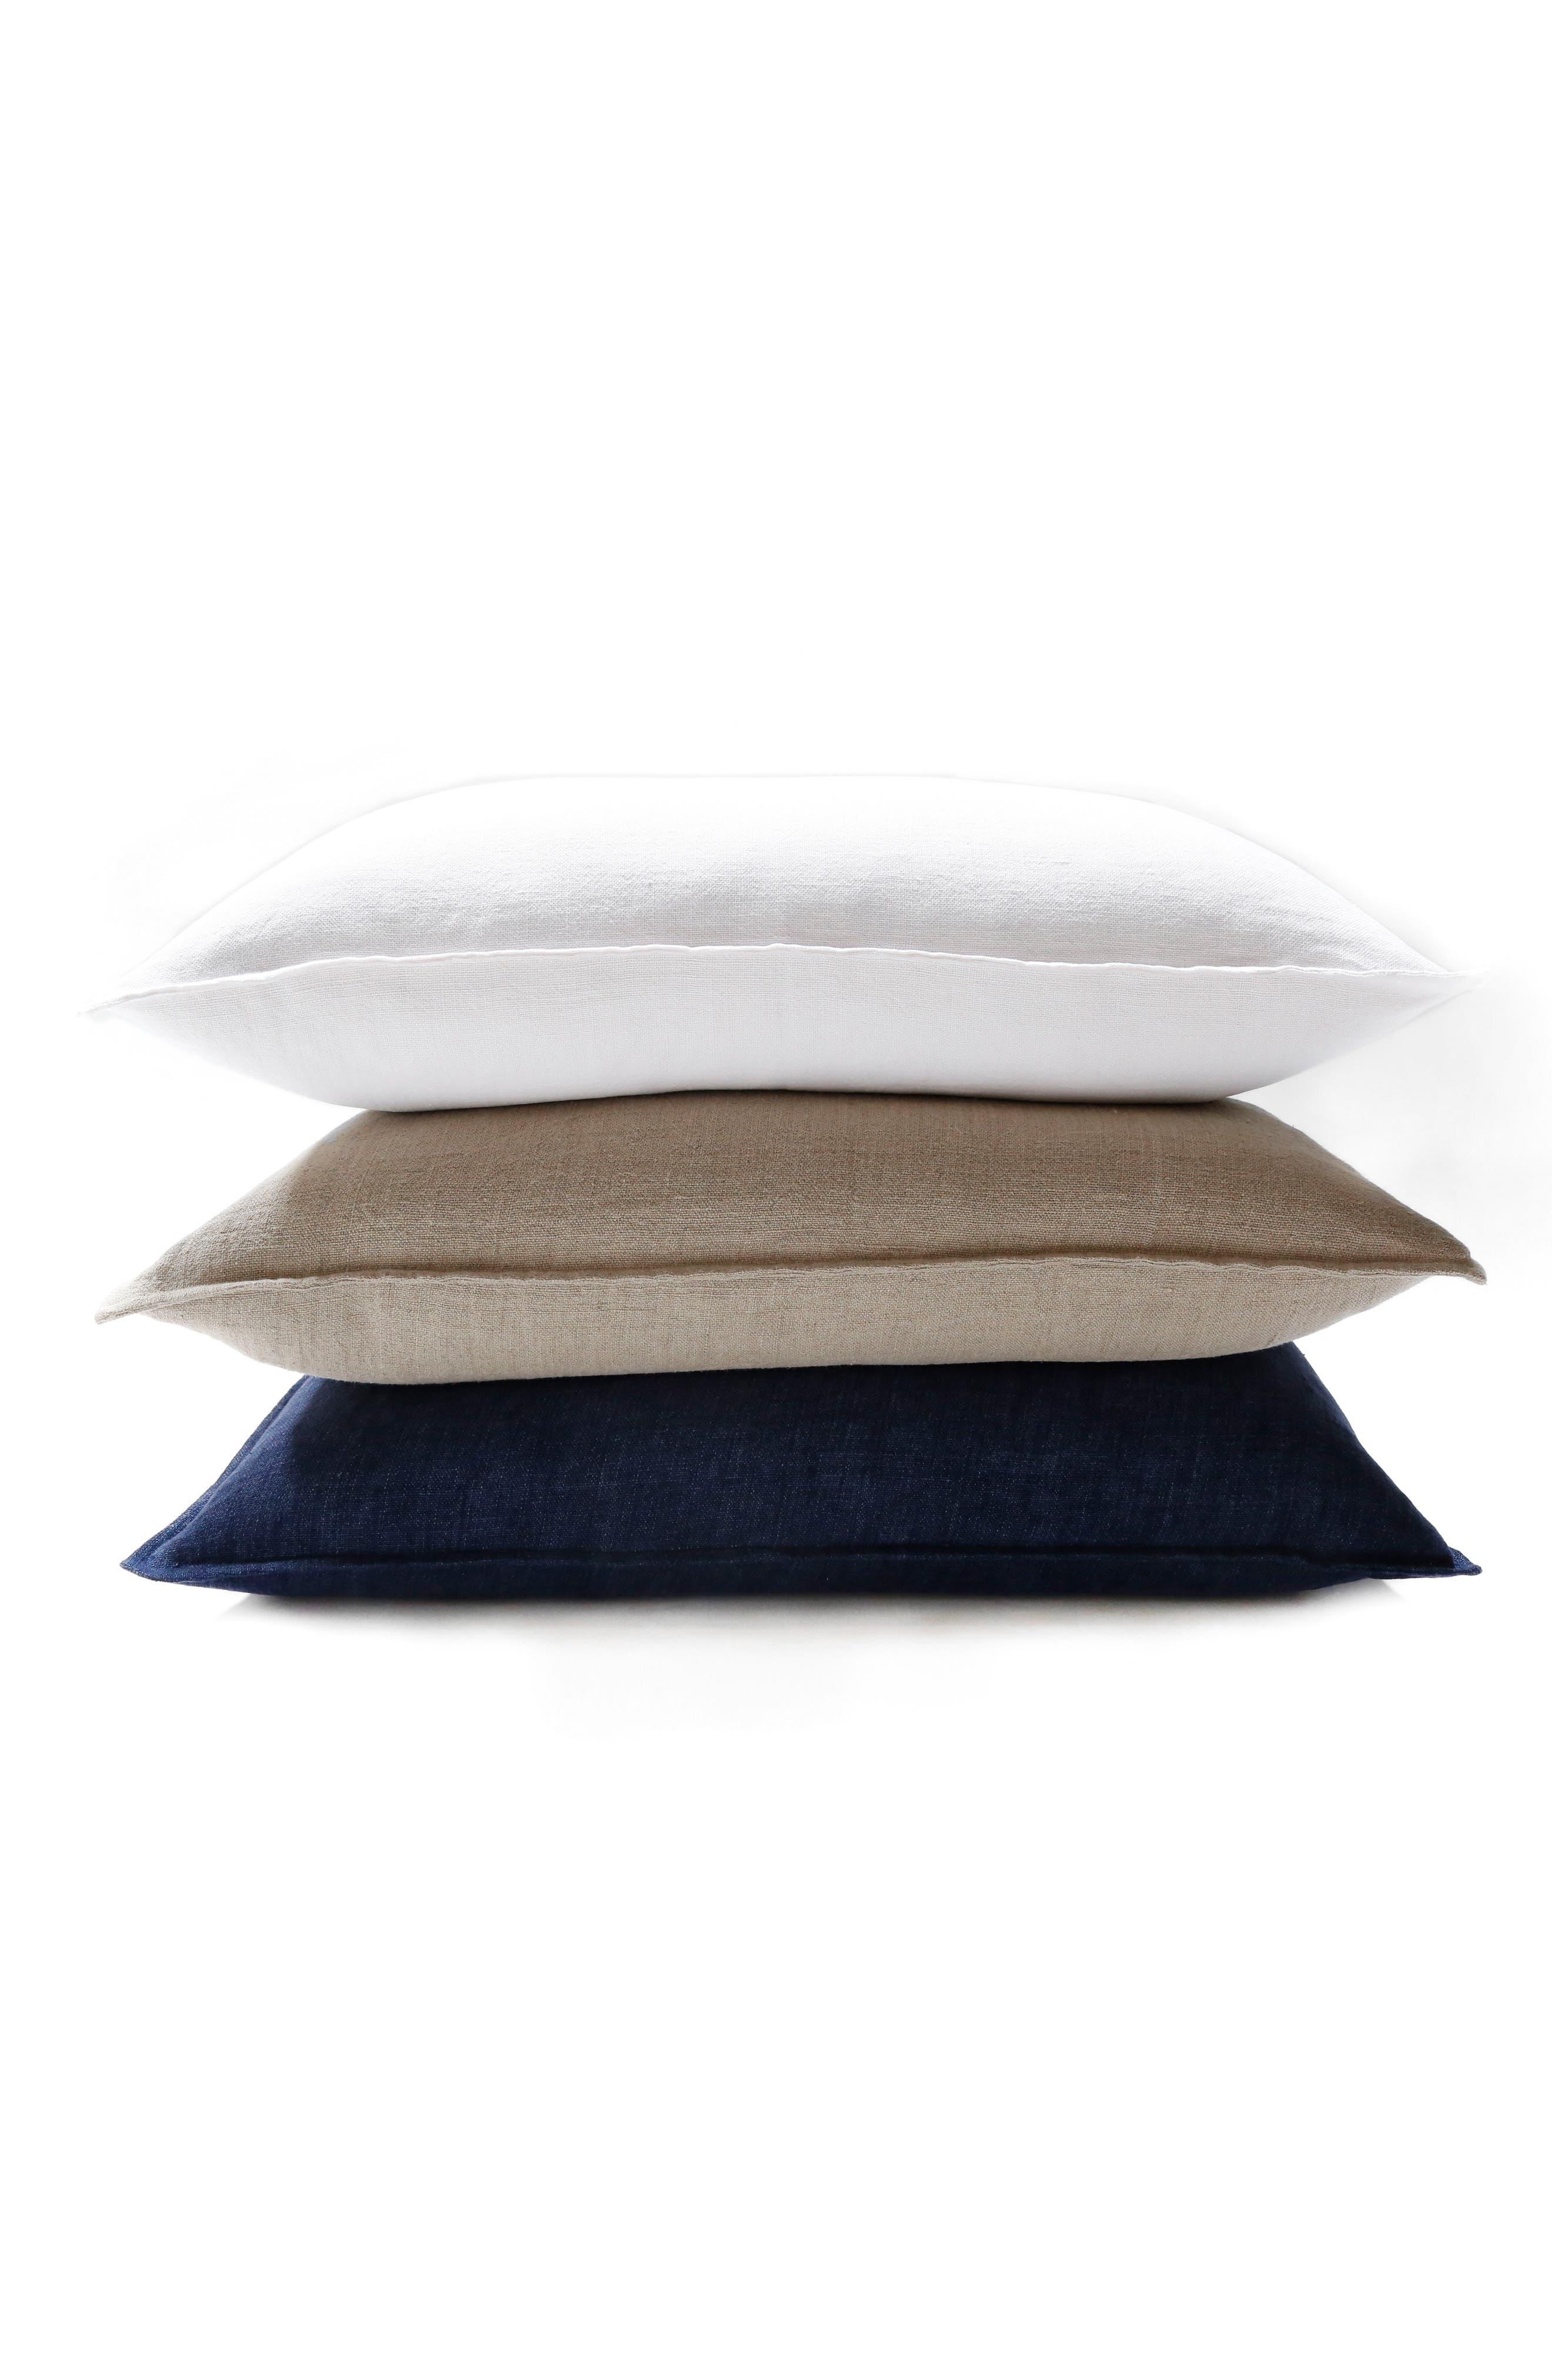 Alternate Image 2  - Pom Pom at Home Montauk Big Accent Pillow